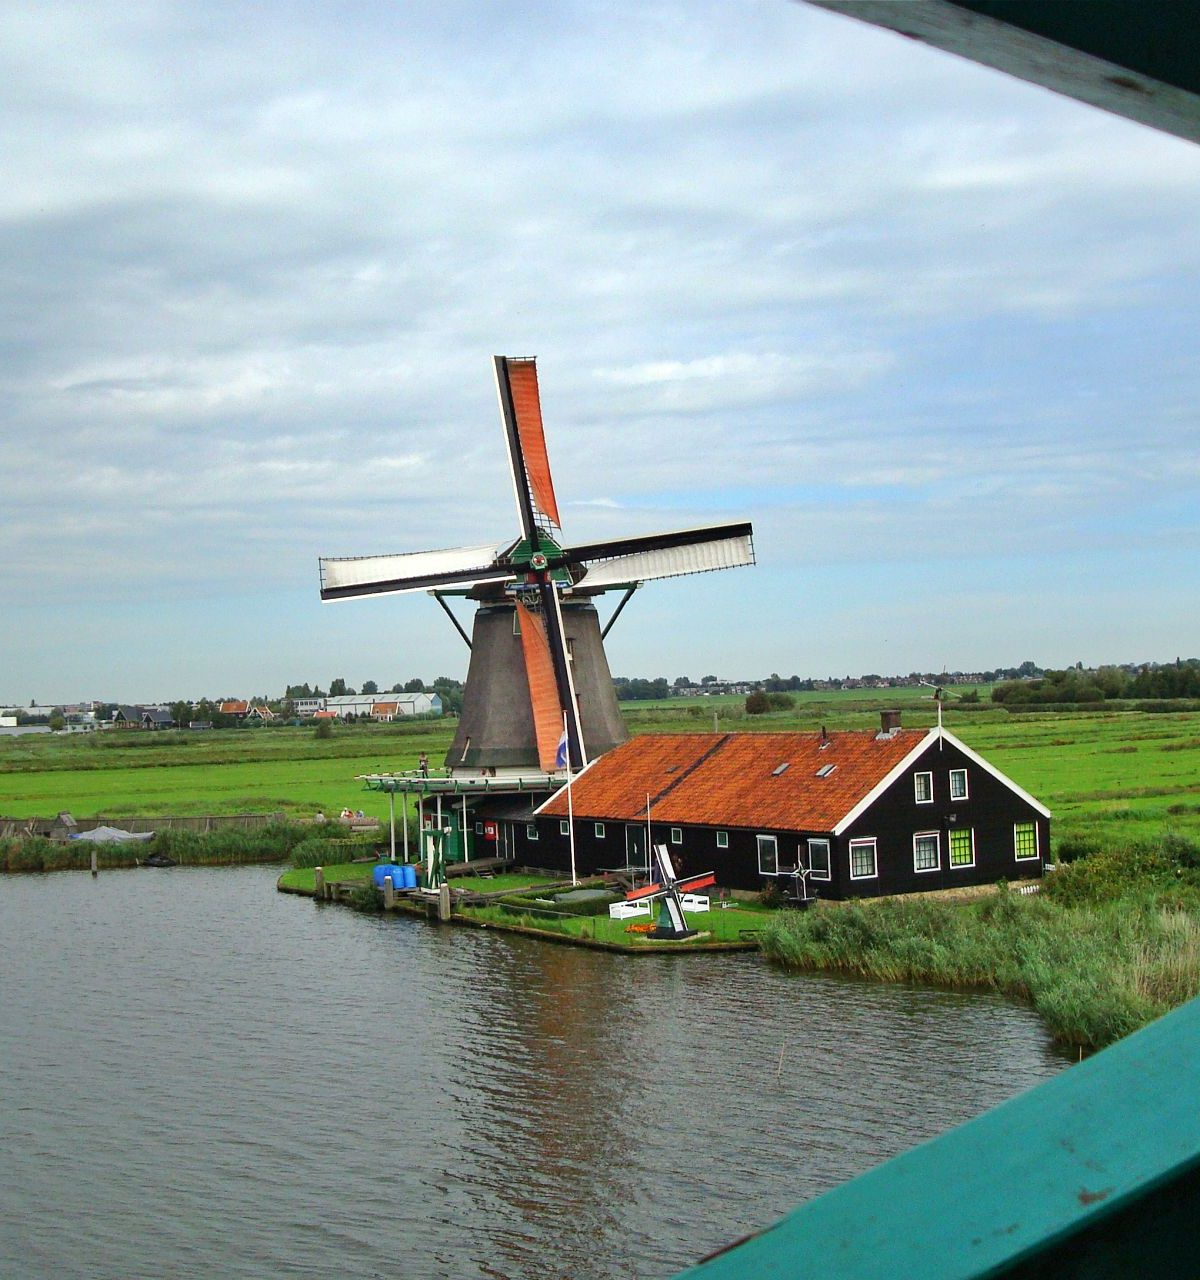 zaanse schans molen noord holland hotelb&b lanormande westwoud13